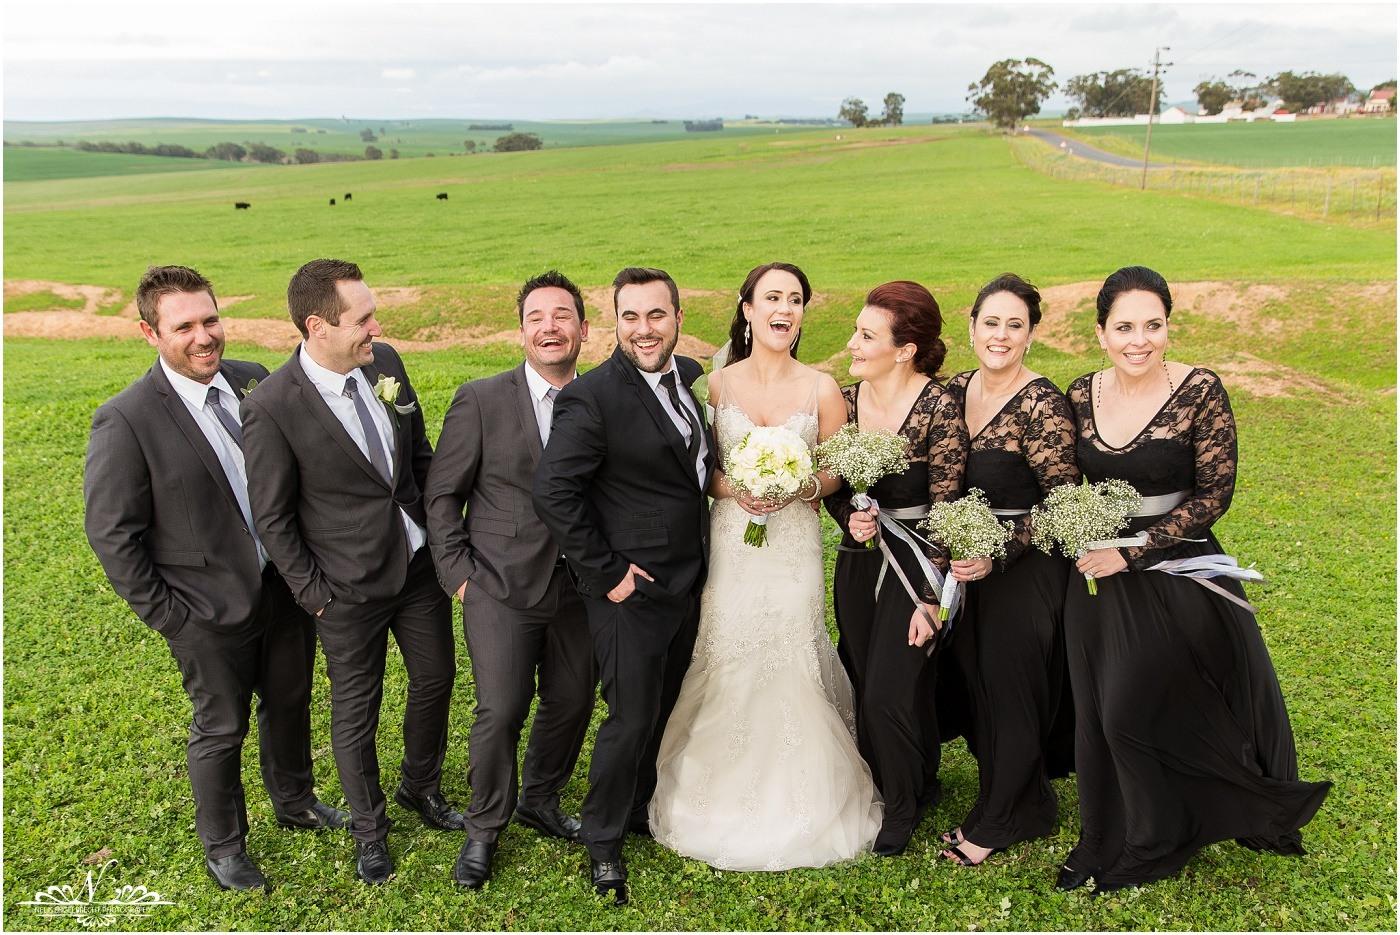 Eensgezind-Wedding-Photos-Nelis-Engelbrecht-Photography-098